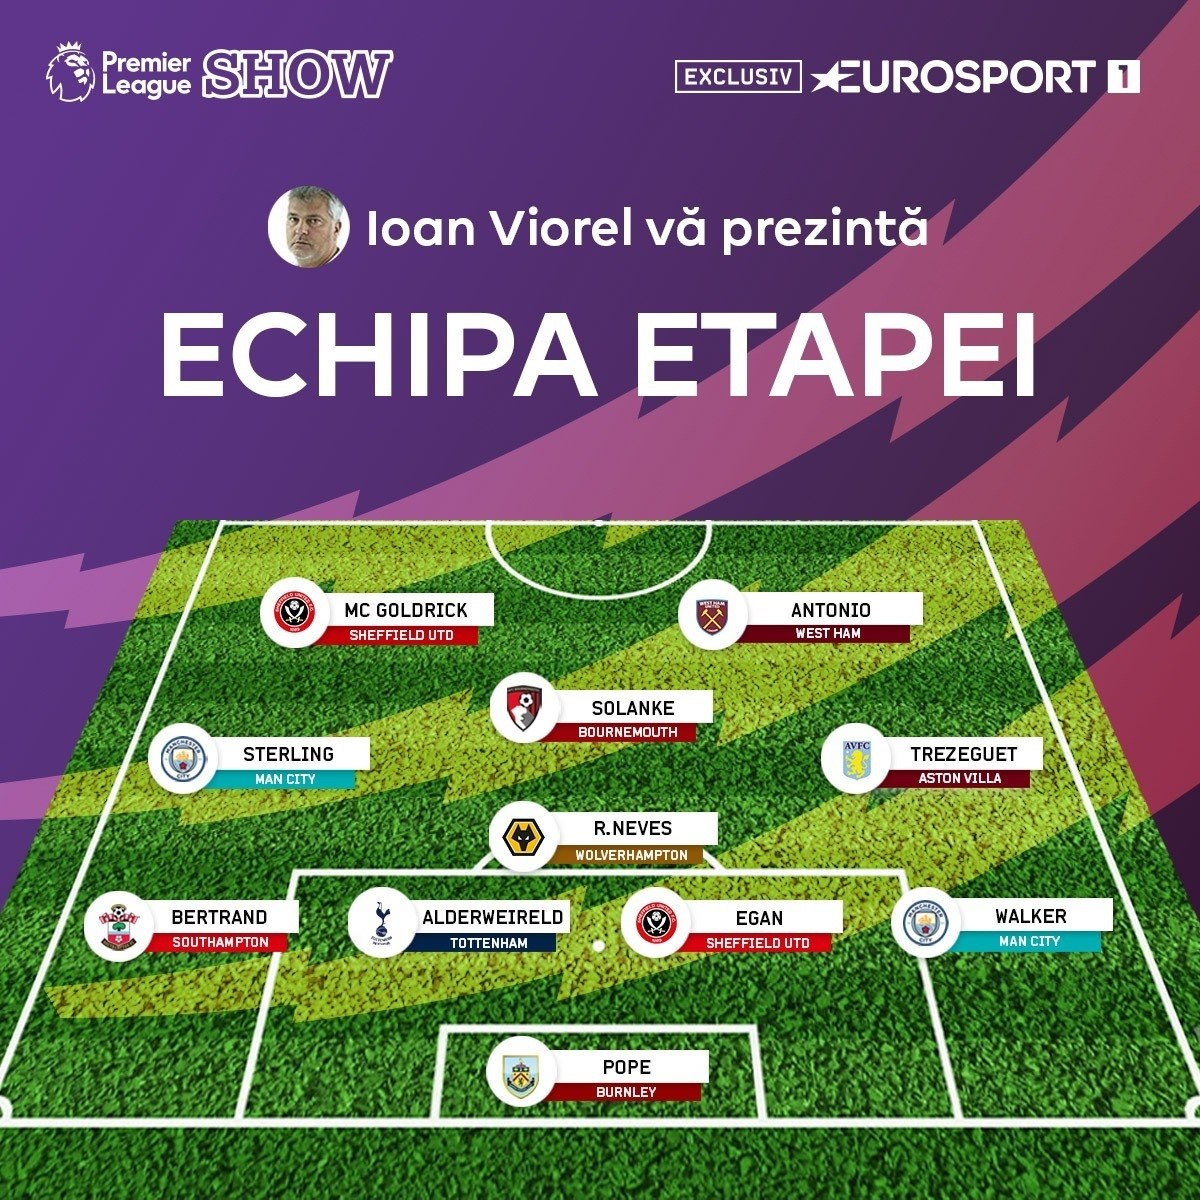 https://i.eurosport.com/2020/07/14/2849893.jpg